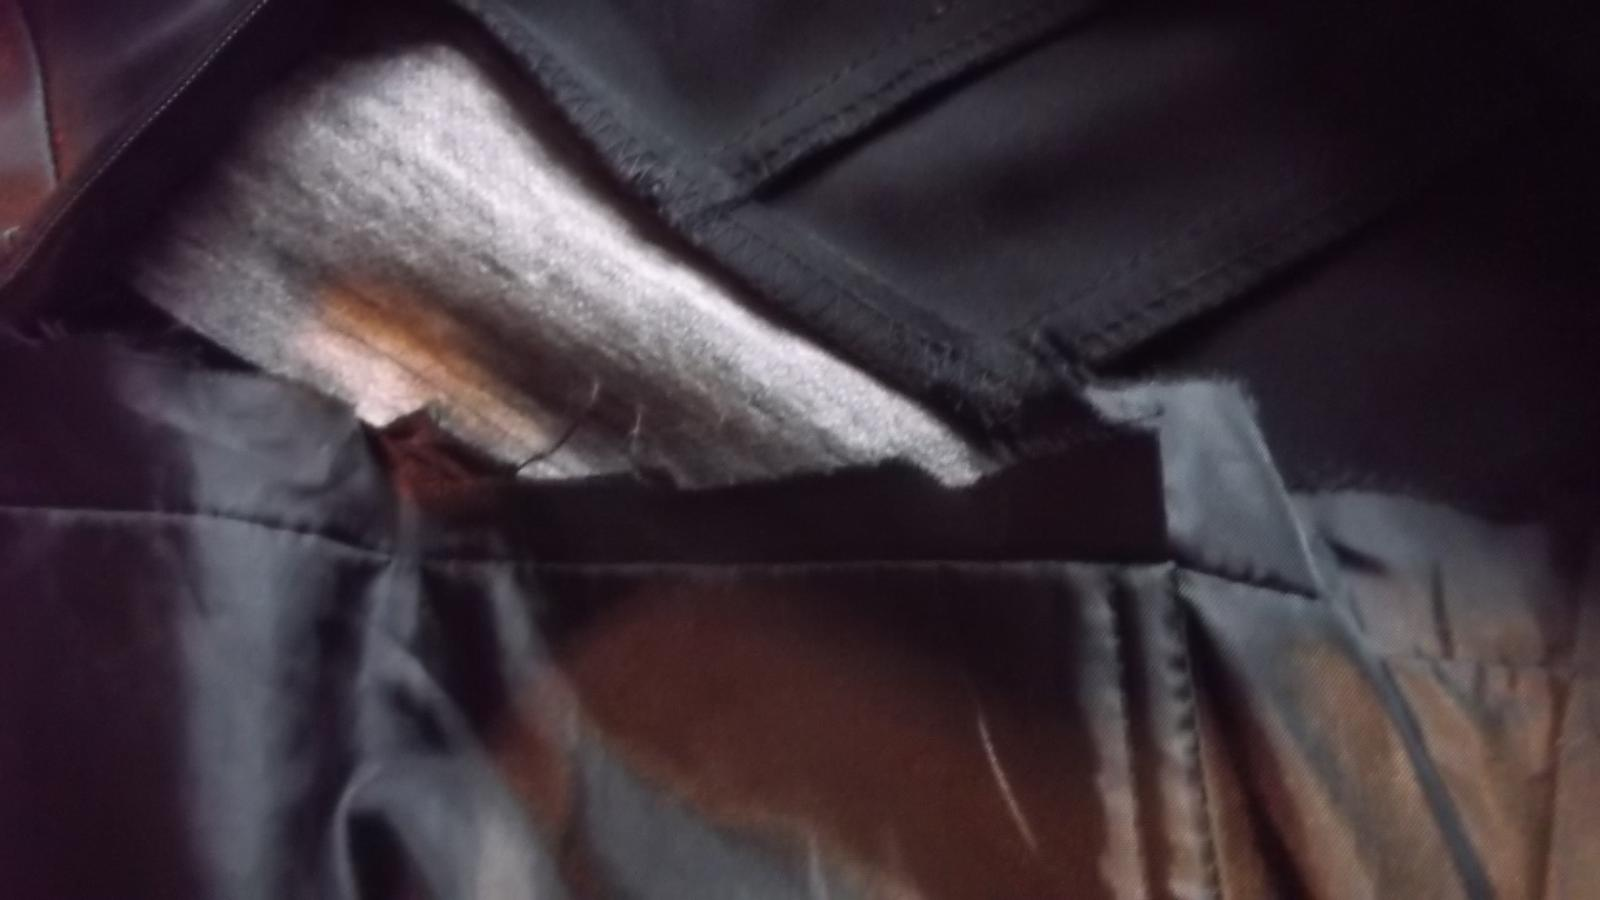 čierne koktailové šaty + topanky - Obrázok č. 4